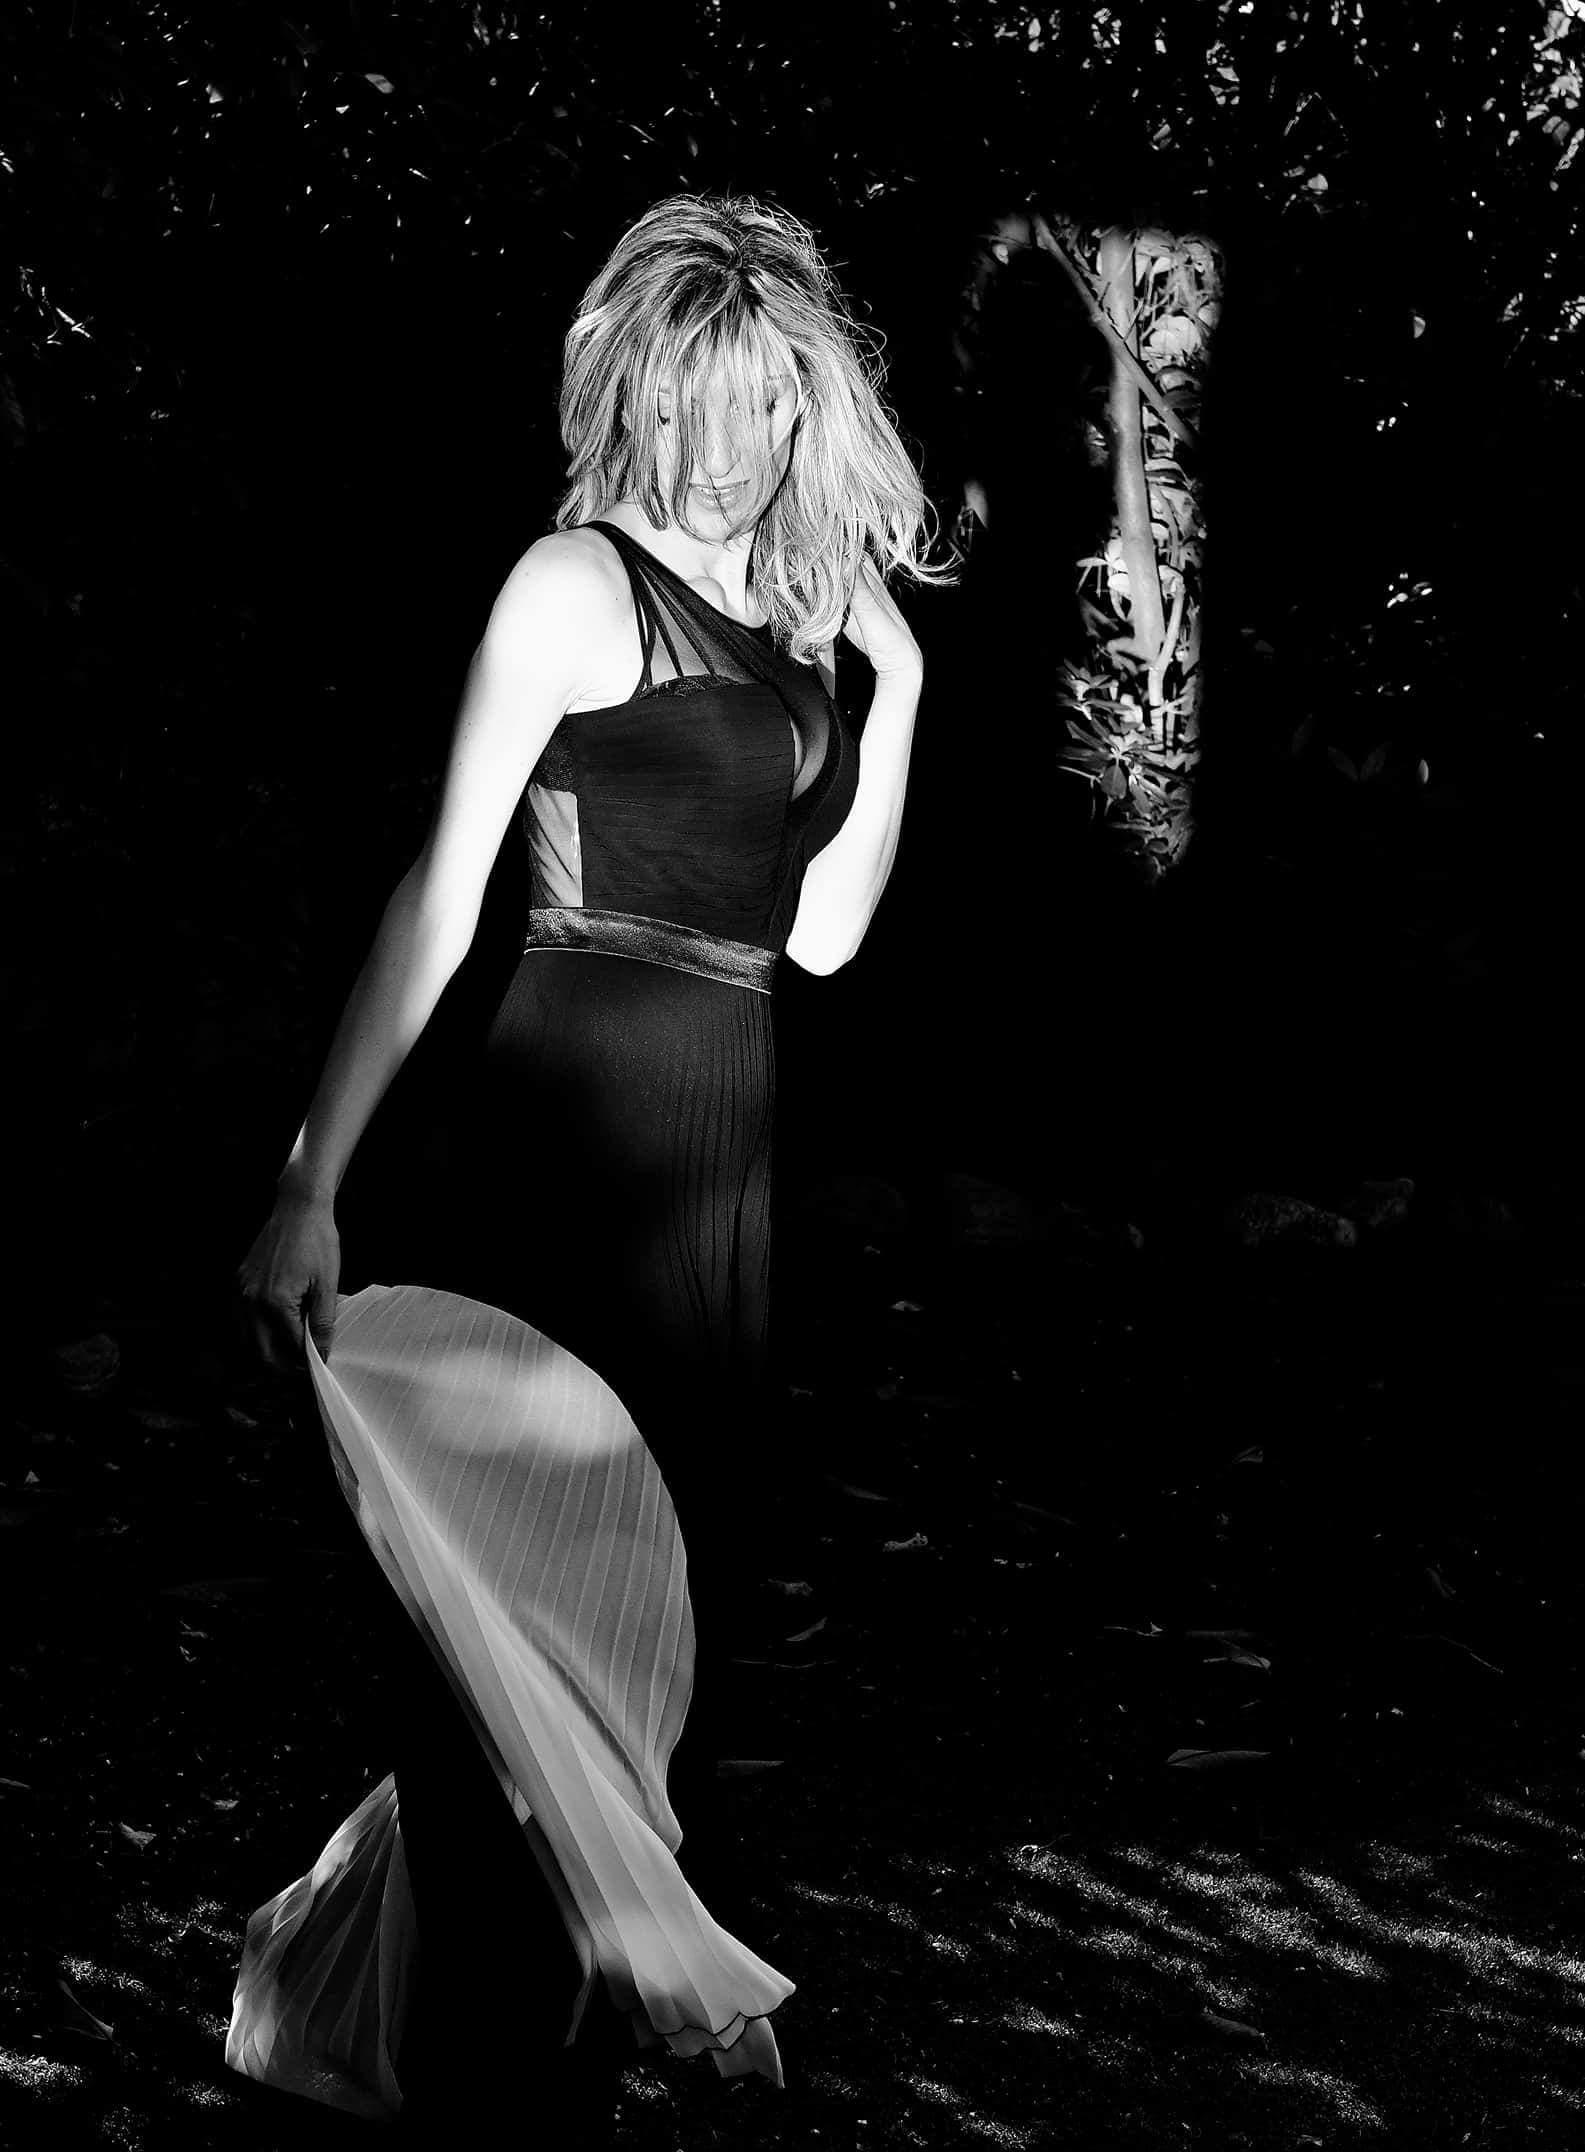 Categories: Fashion, Glamour, Portrait; Ph. DANILO DONADIO; Model, MUA & Stylist: ROSANNA AMATULLI – Nickname: MAGNIFIC82; Location: Verbania (VB)